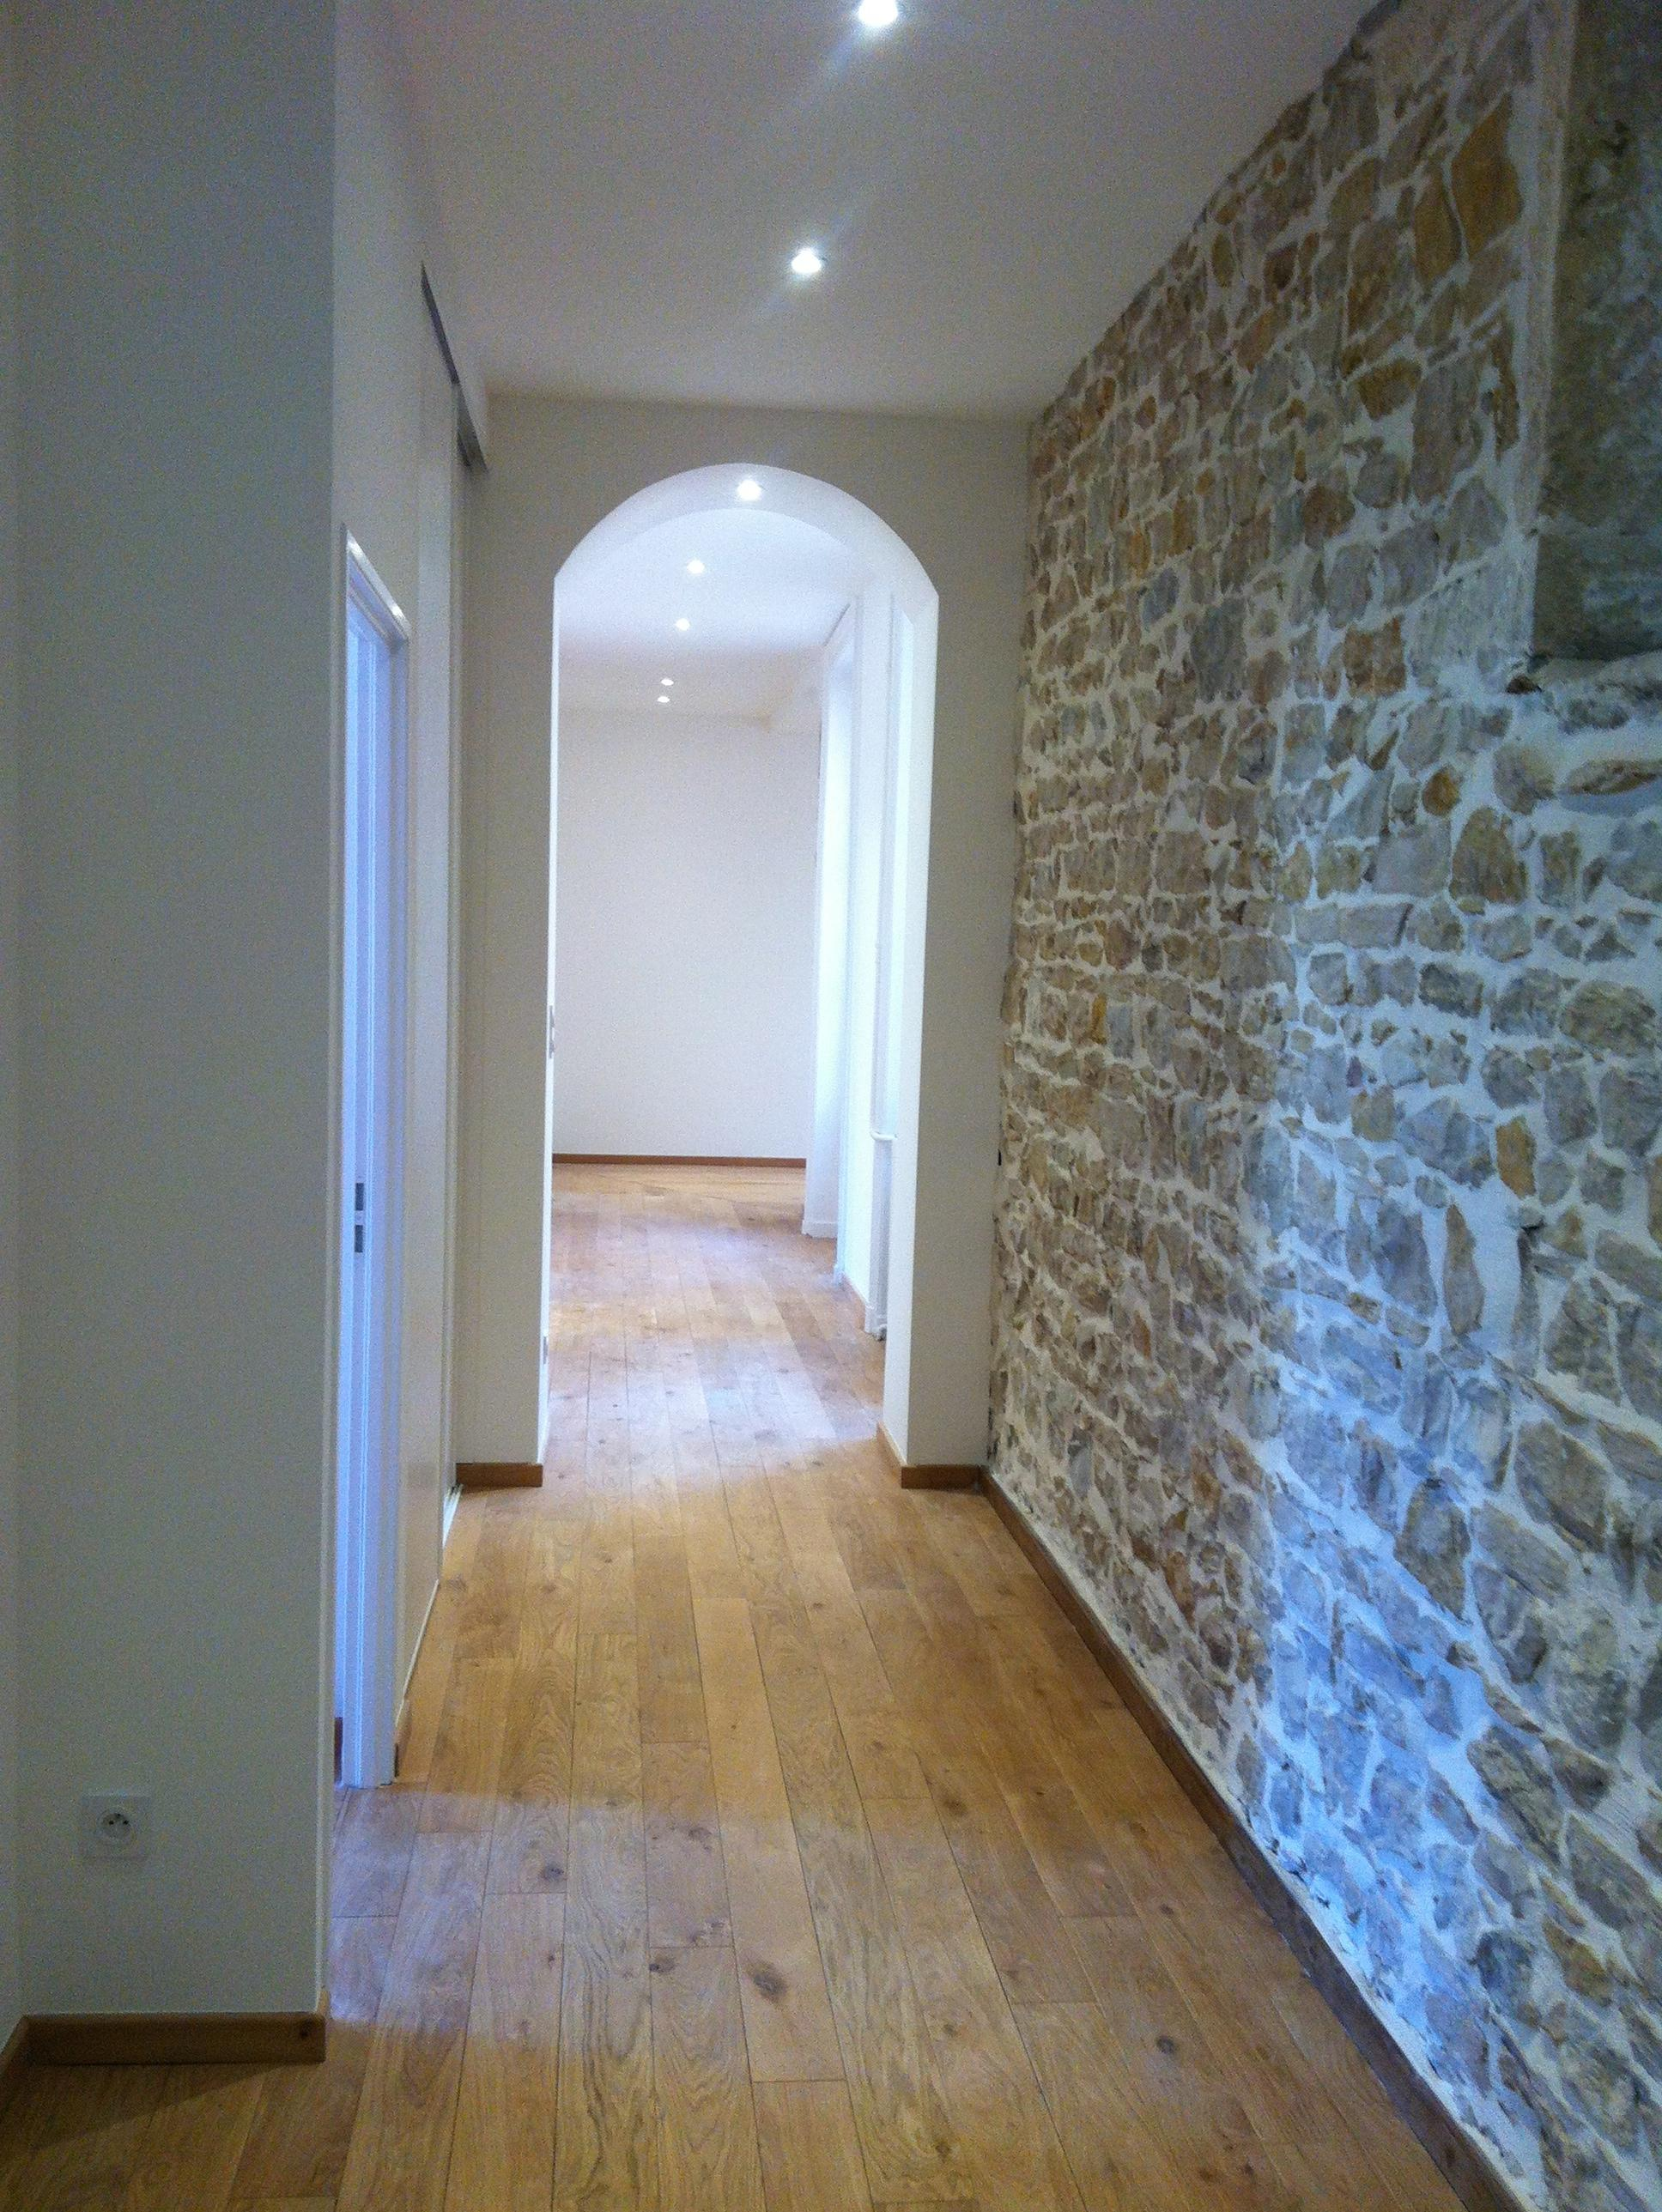 Дизайн коридора с аркой эллипсной